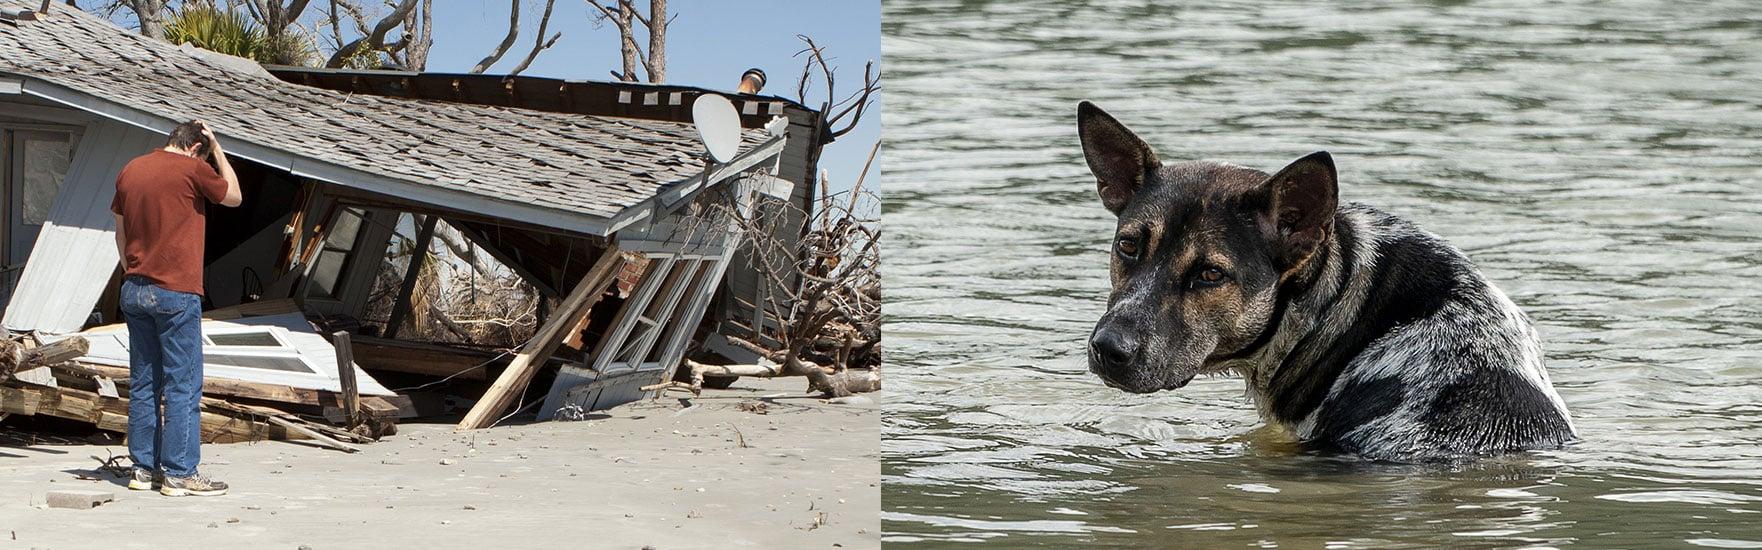 disaster-hurricaneida-impactupdates-header-image